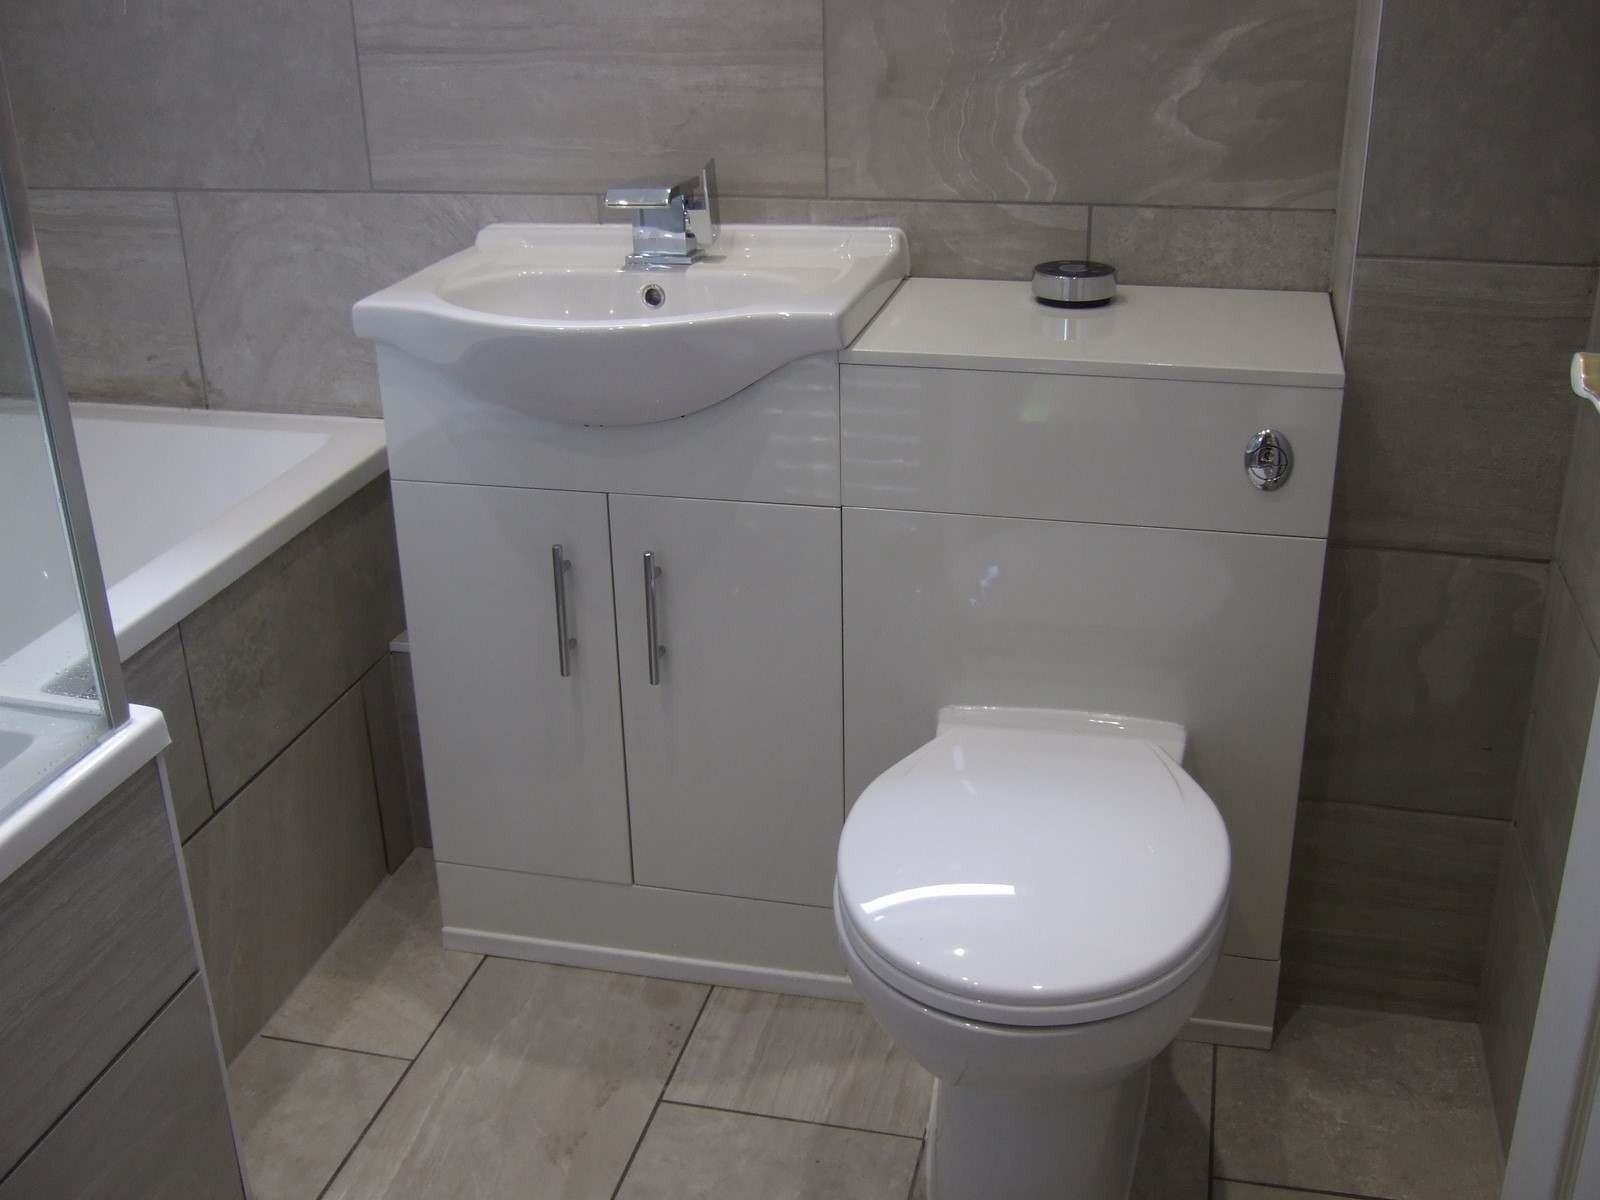 Grey Bathroom Floor Tiles Luxury Inverno Grey Marble Rectified Wall and Floor Tile Wall Tiles Pattern